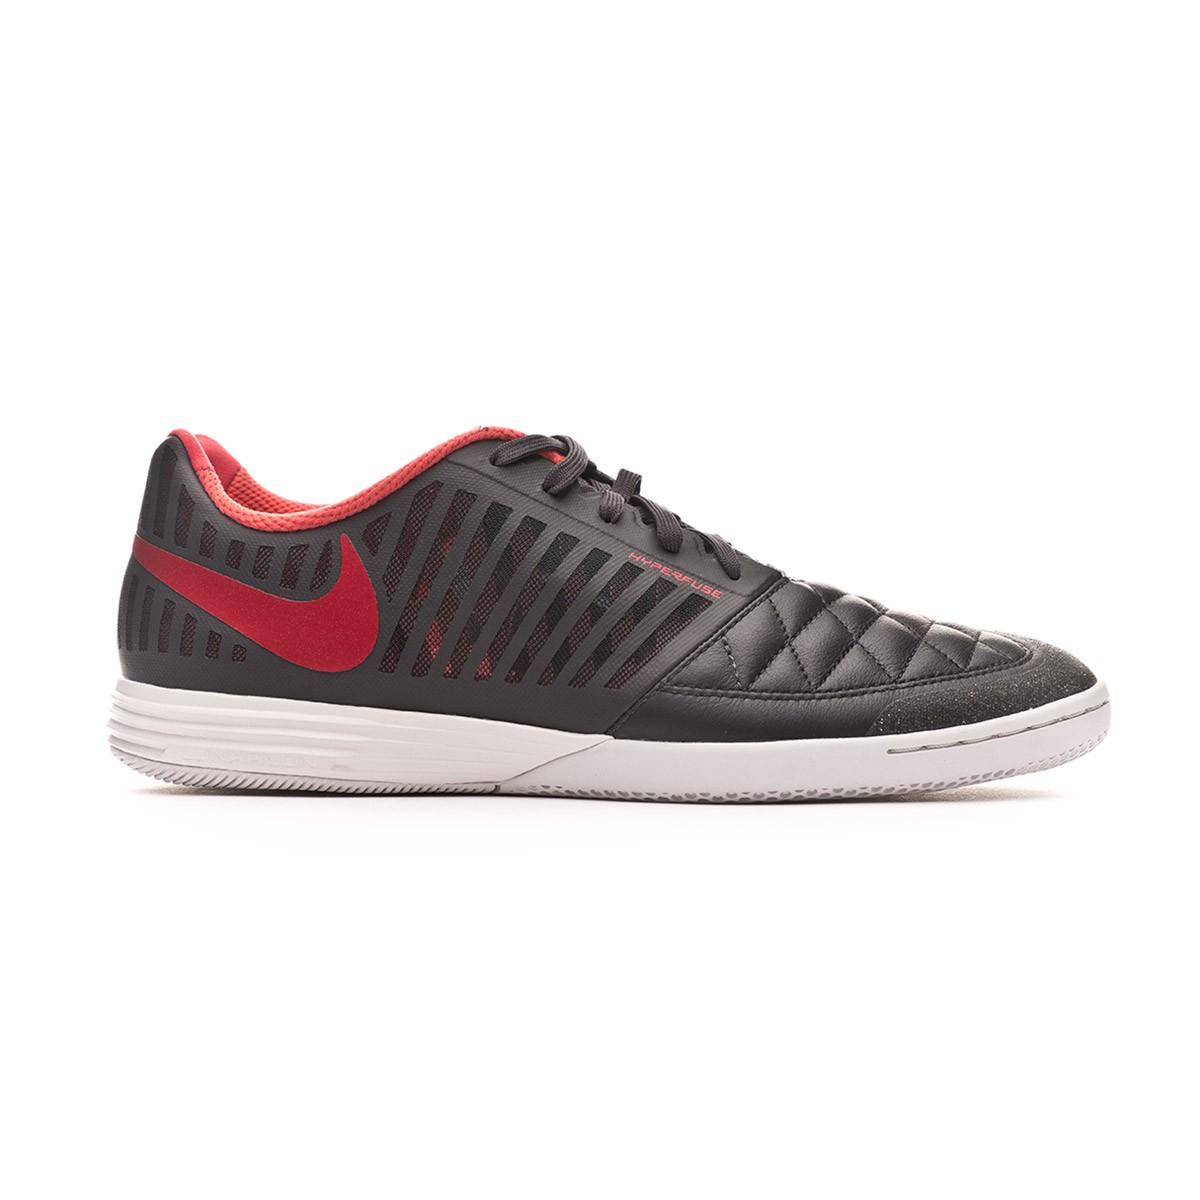 best website 14da0 42818 Futsal Boot Nike Lunar Gato II IC Anthracite-Ember glow-Platinum tint -  Football store Fútbol Emotion